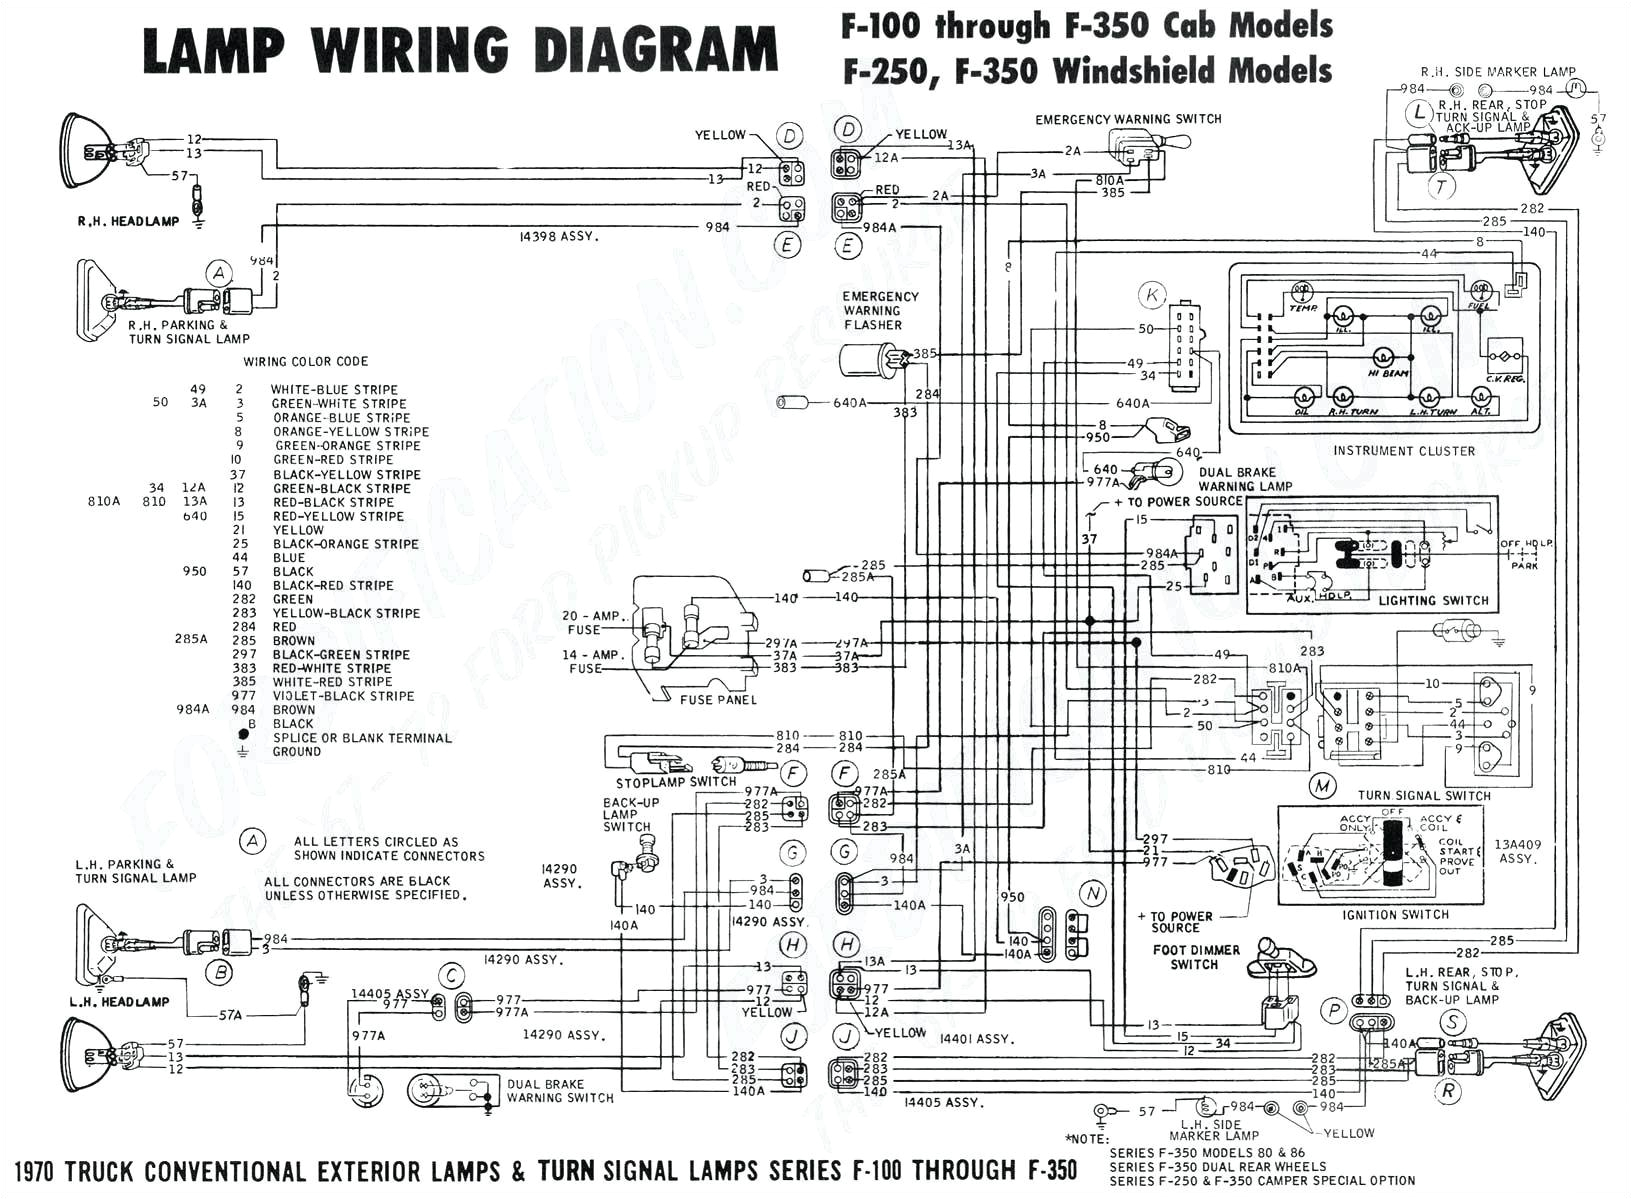 dodge ram 1500 fuel tank diagram furthermore electrical legend dodge wiring diagram symbols